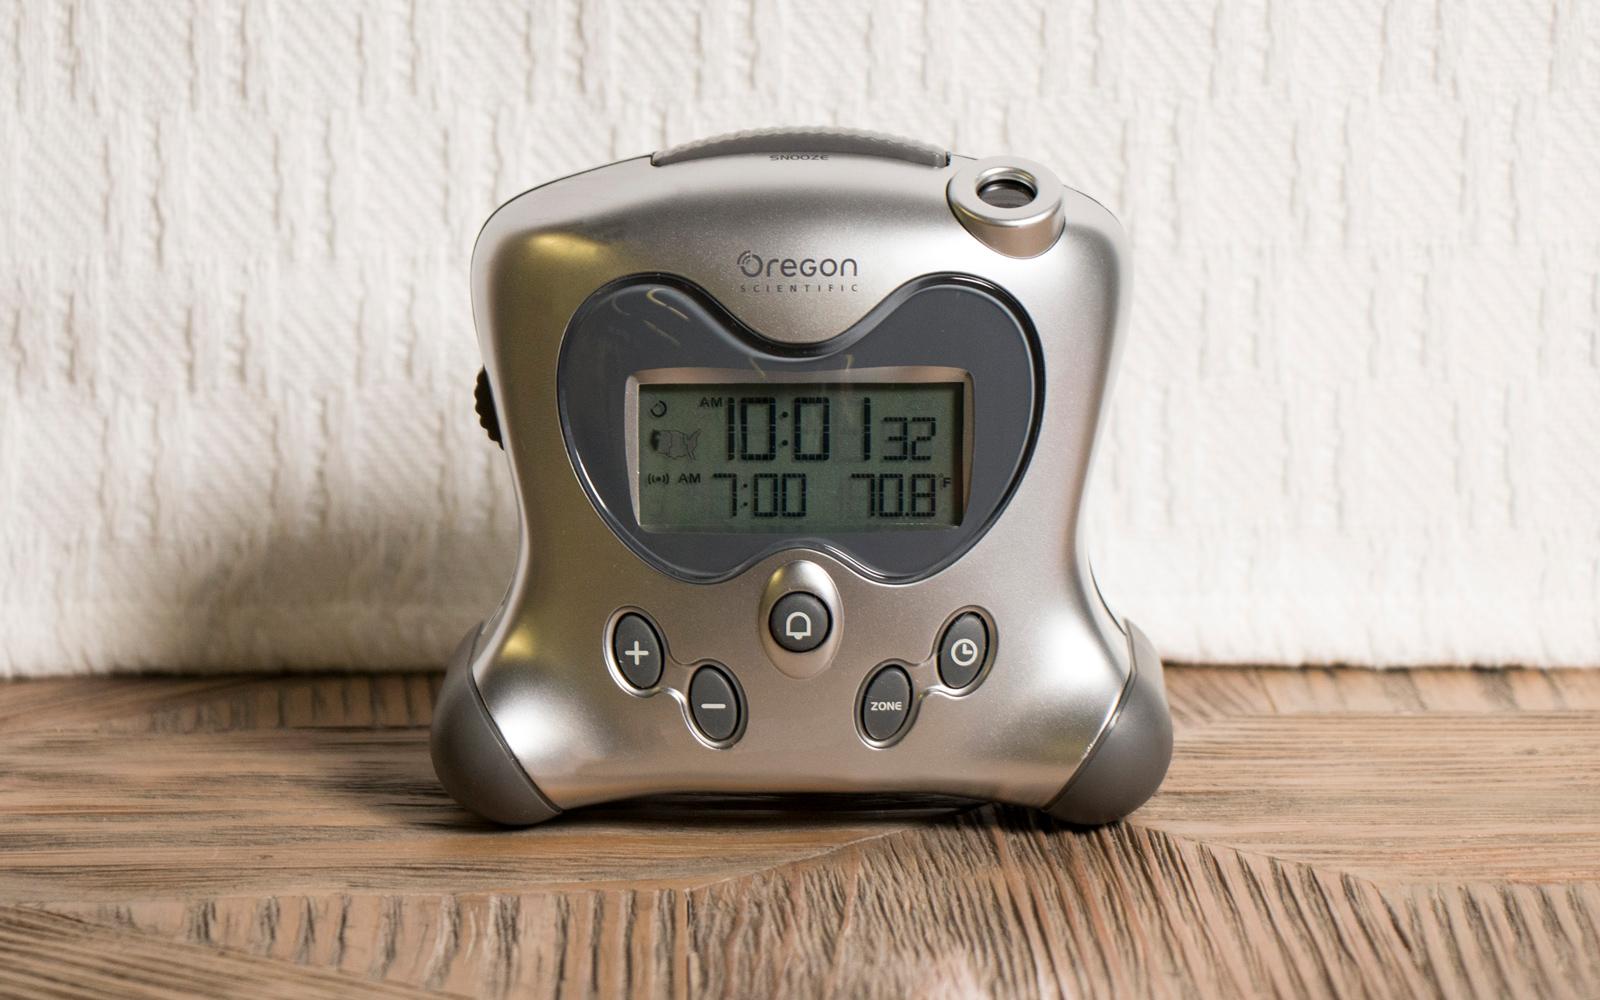 Best Alarm Clocks 2019 - Clock Radios and Battery Backup